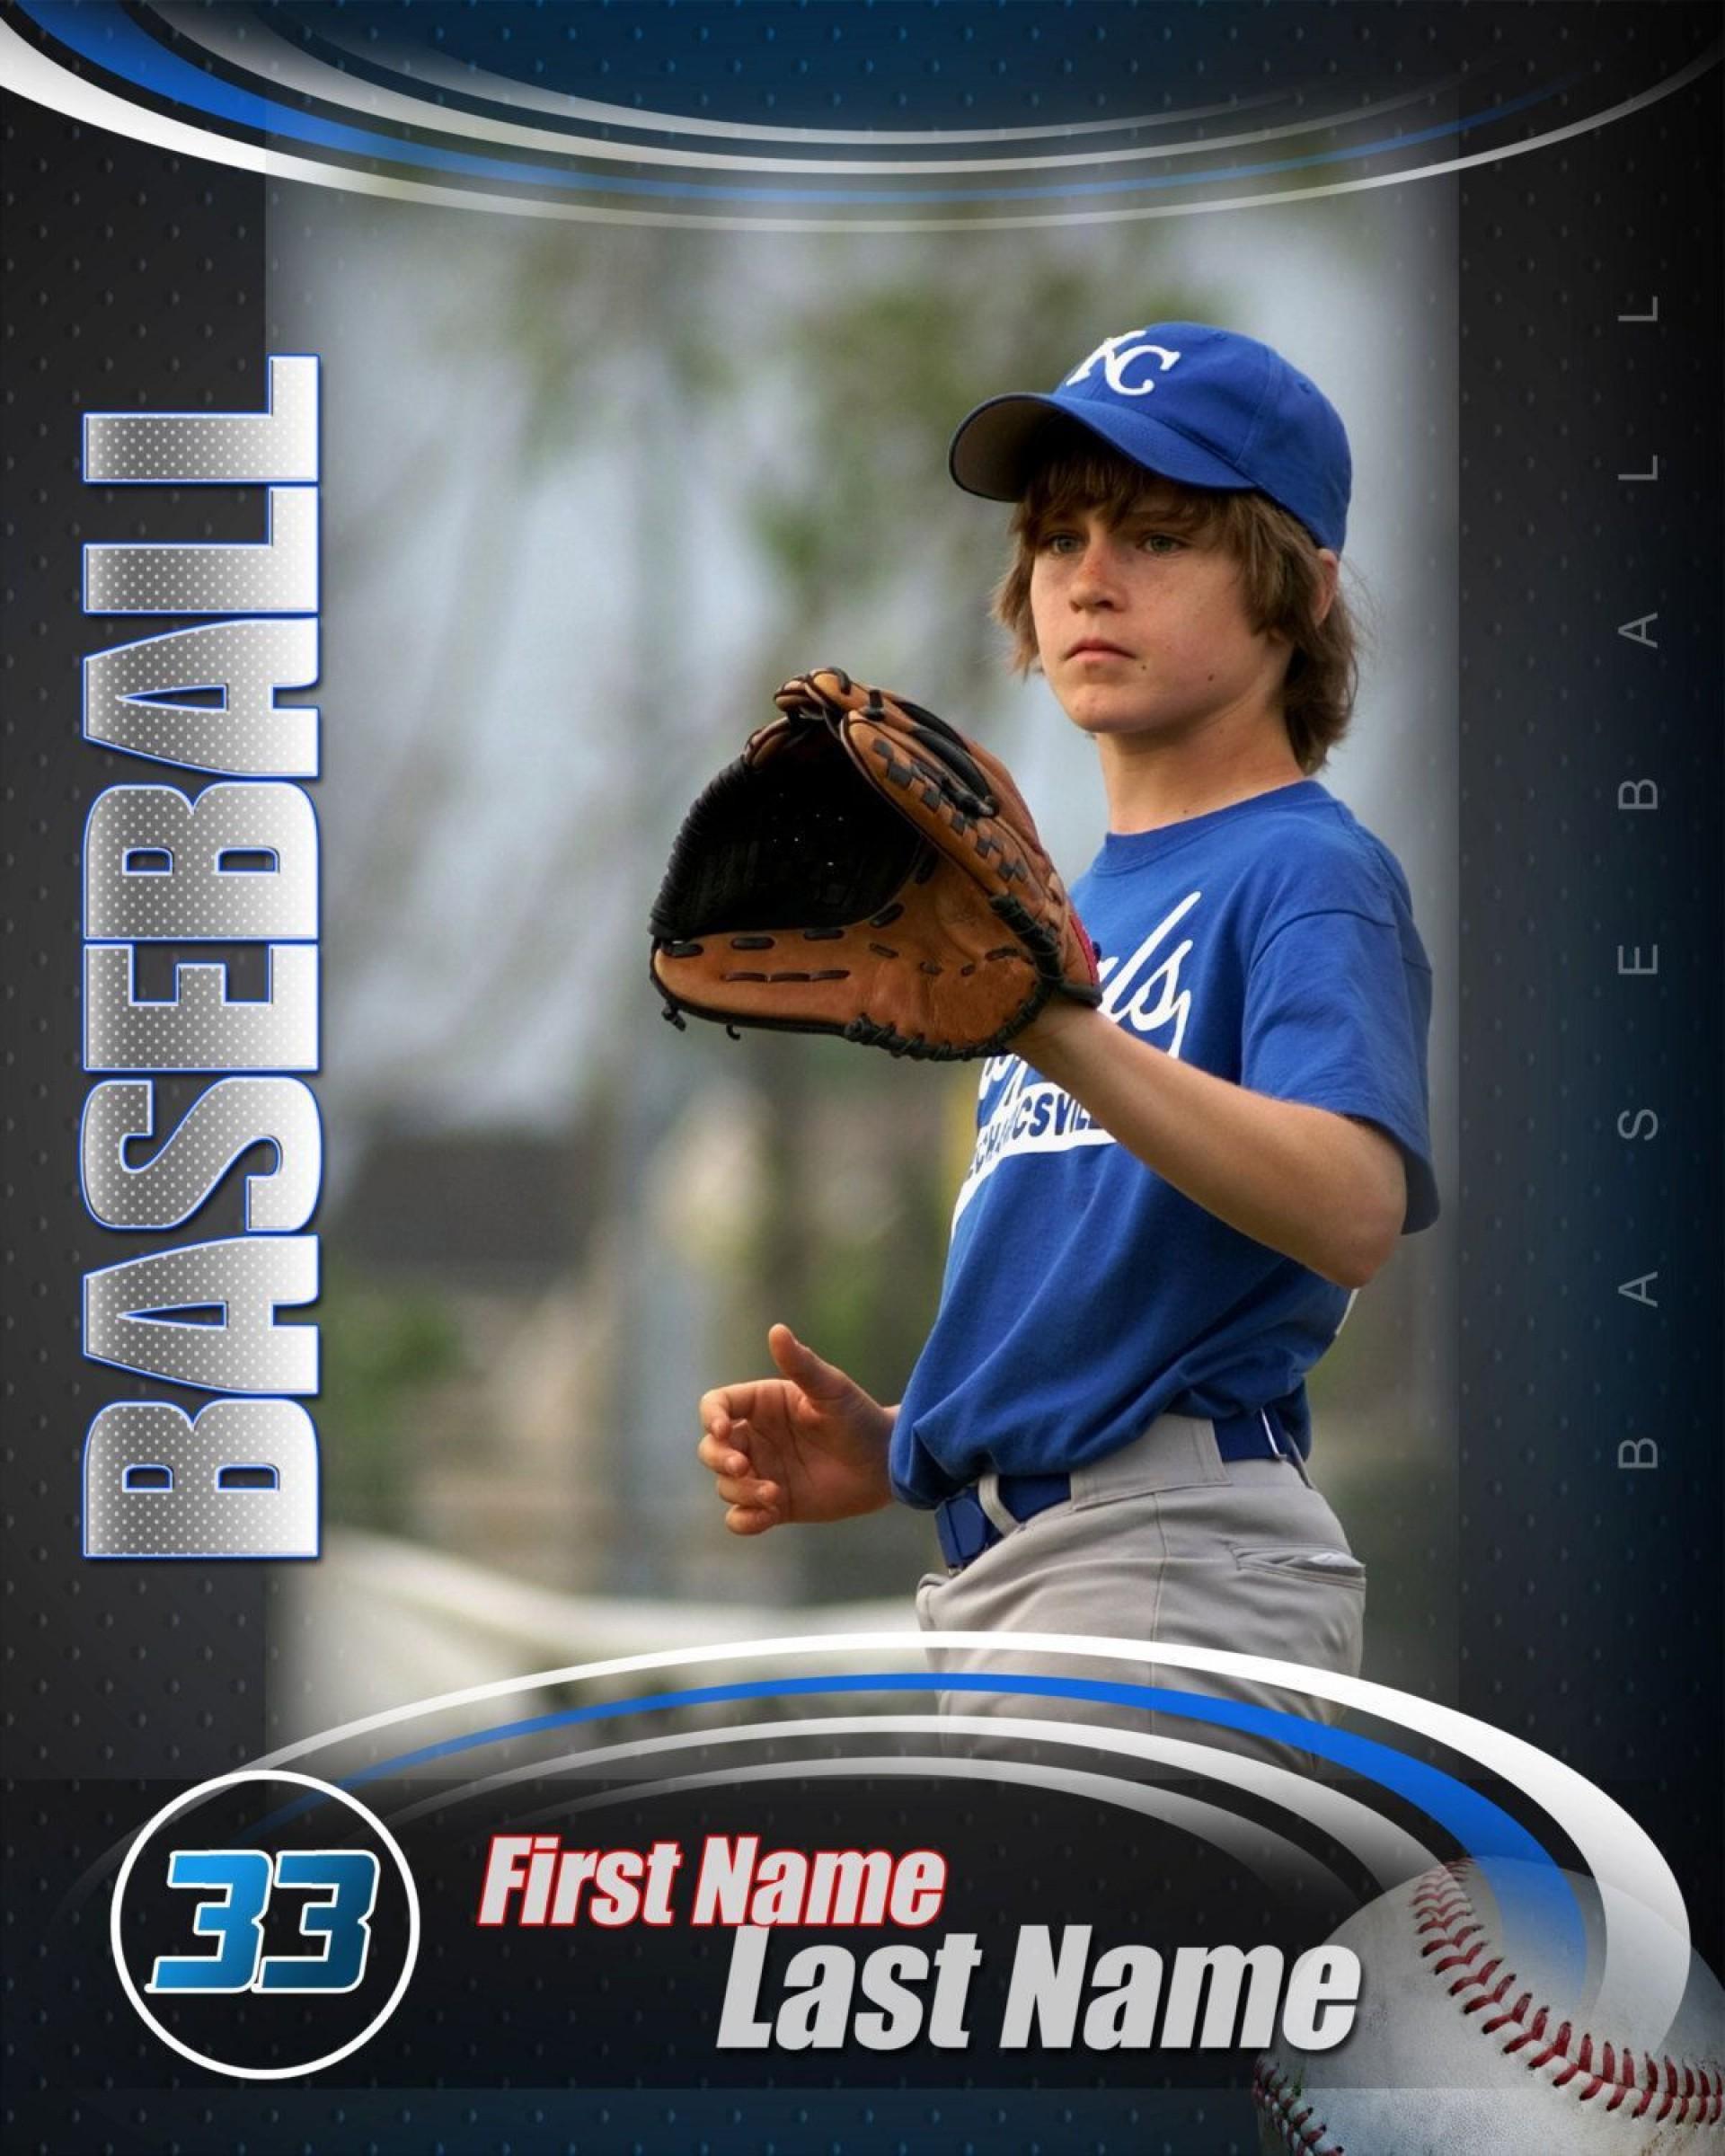 000 Imposing Baseball Card Template Photoshop Concept  Topp Free1920